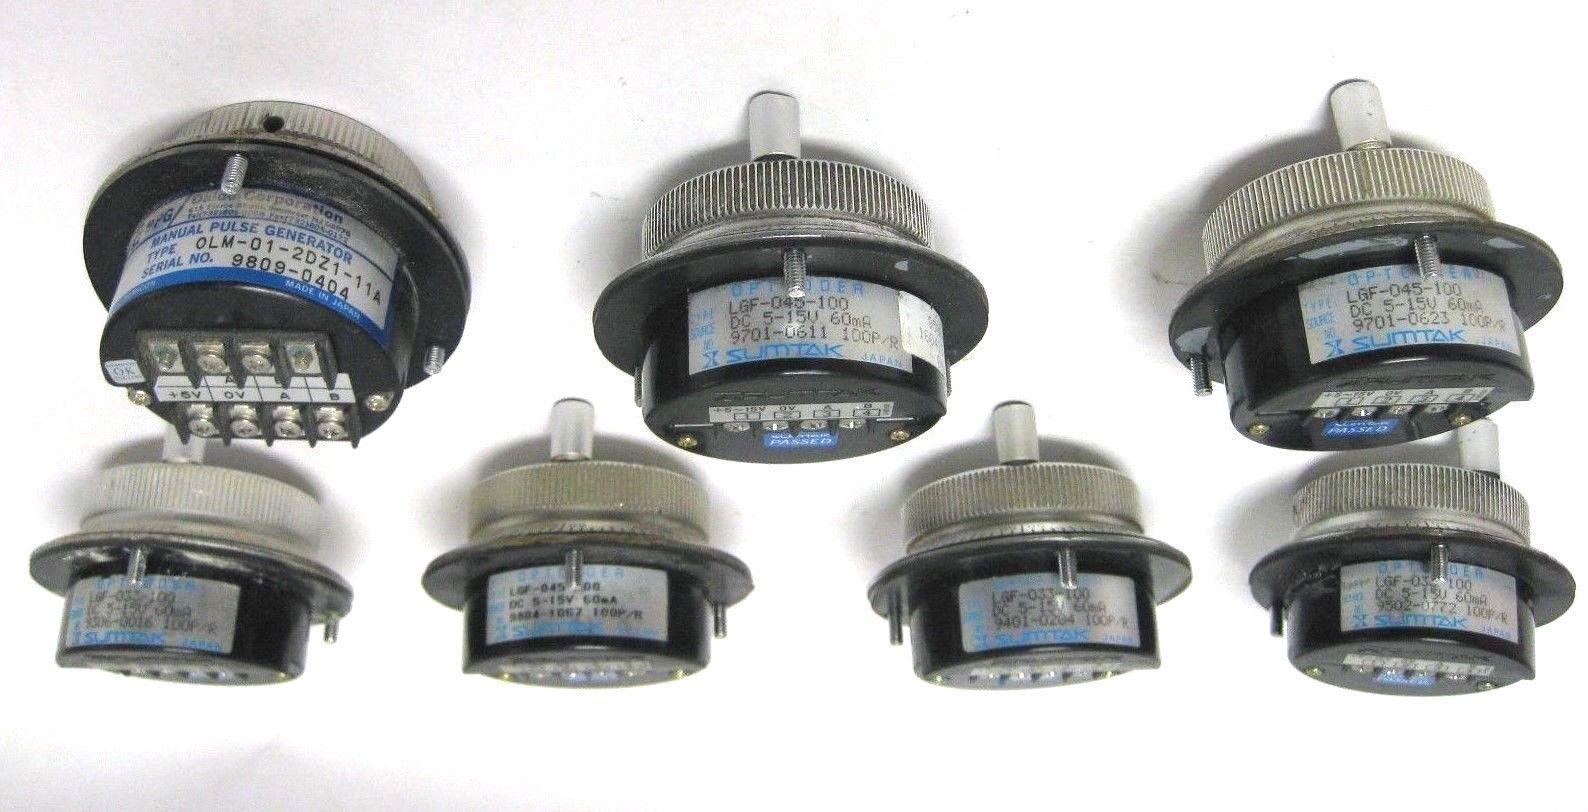 Sumtak Handwheel 5 15V LGF Series Lot 322479552253 4